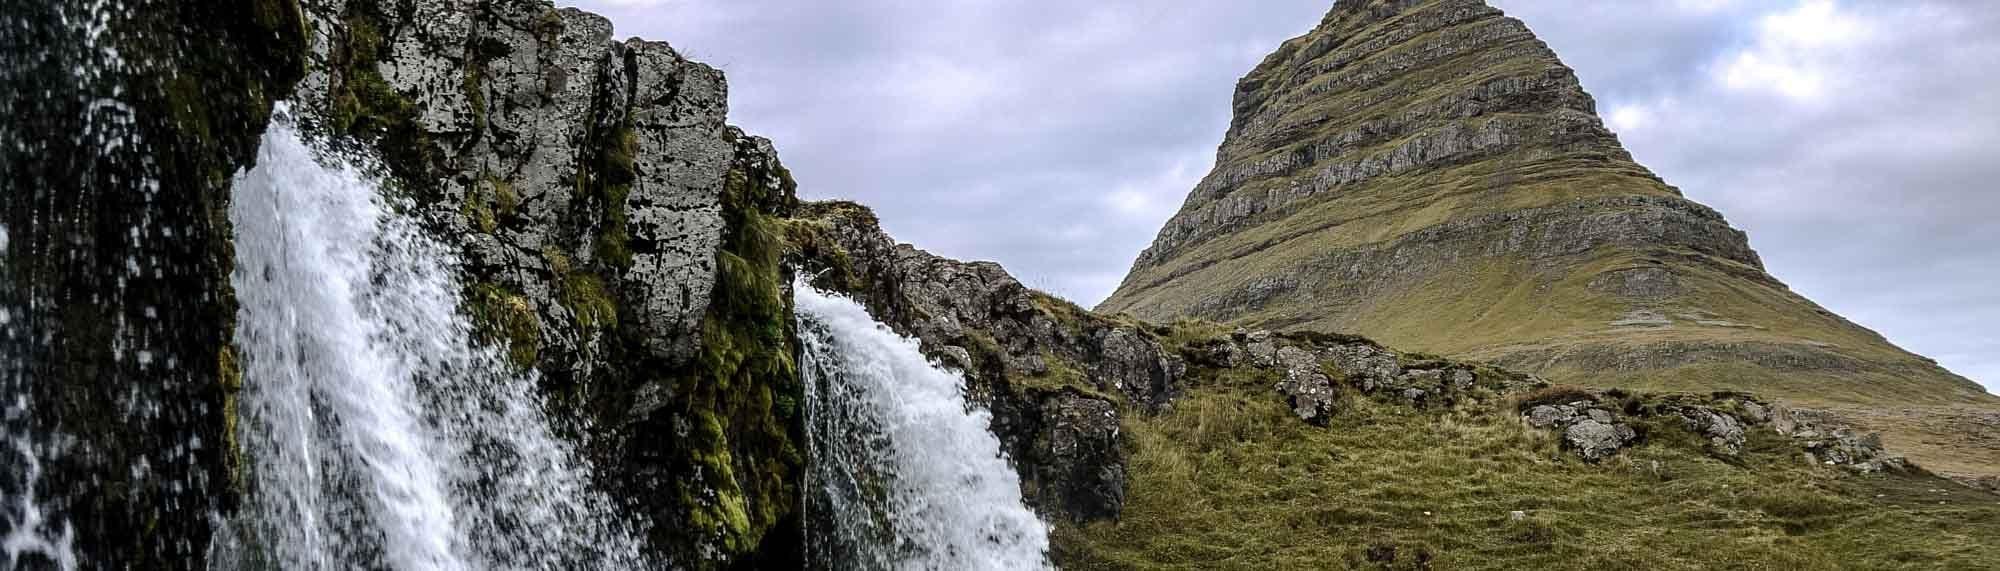 Snaefellsnes mountain Kirkjufell